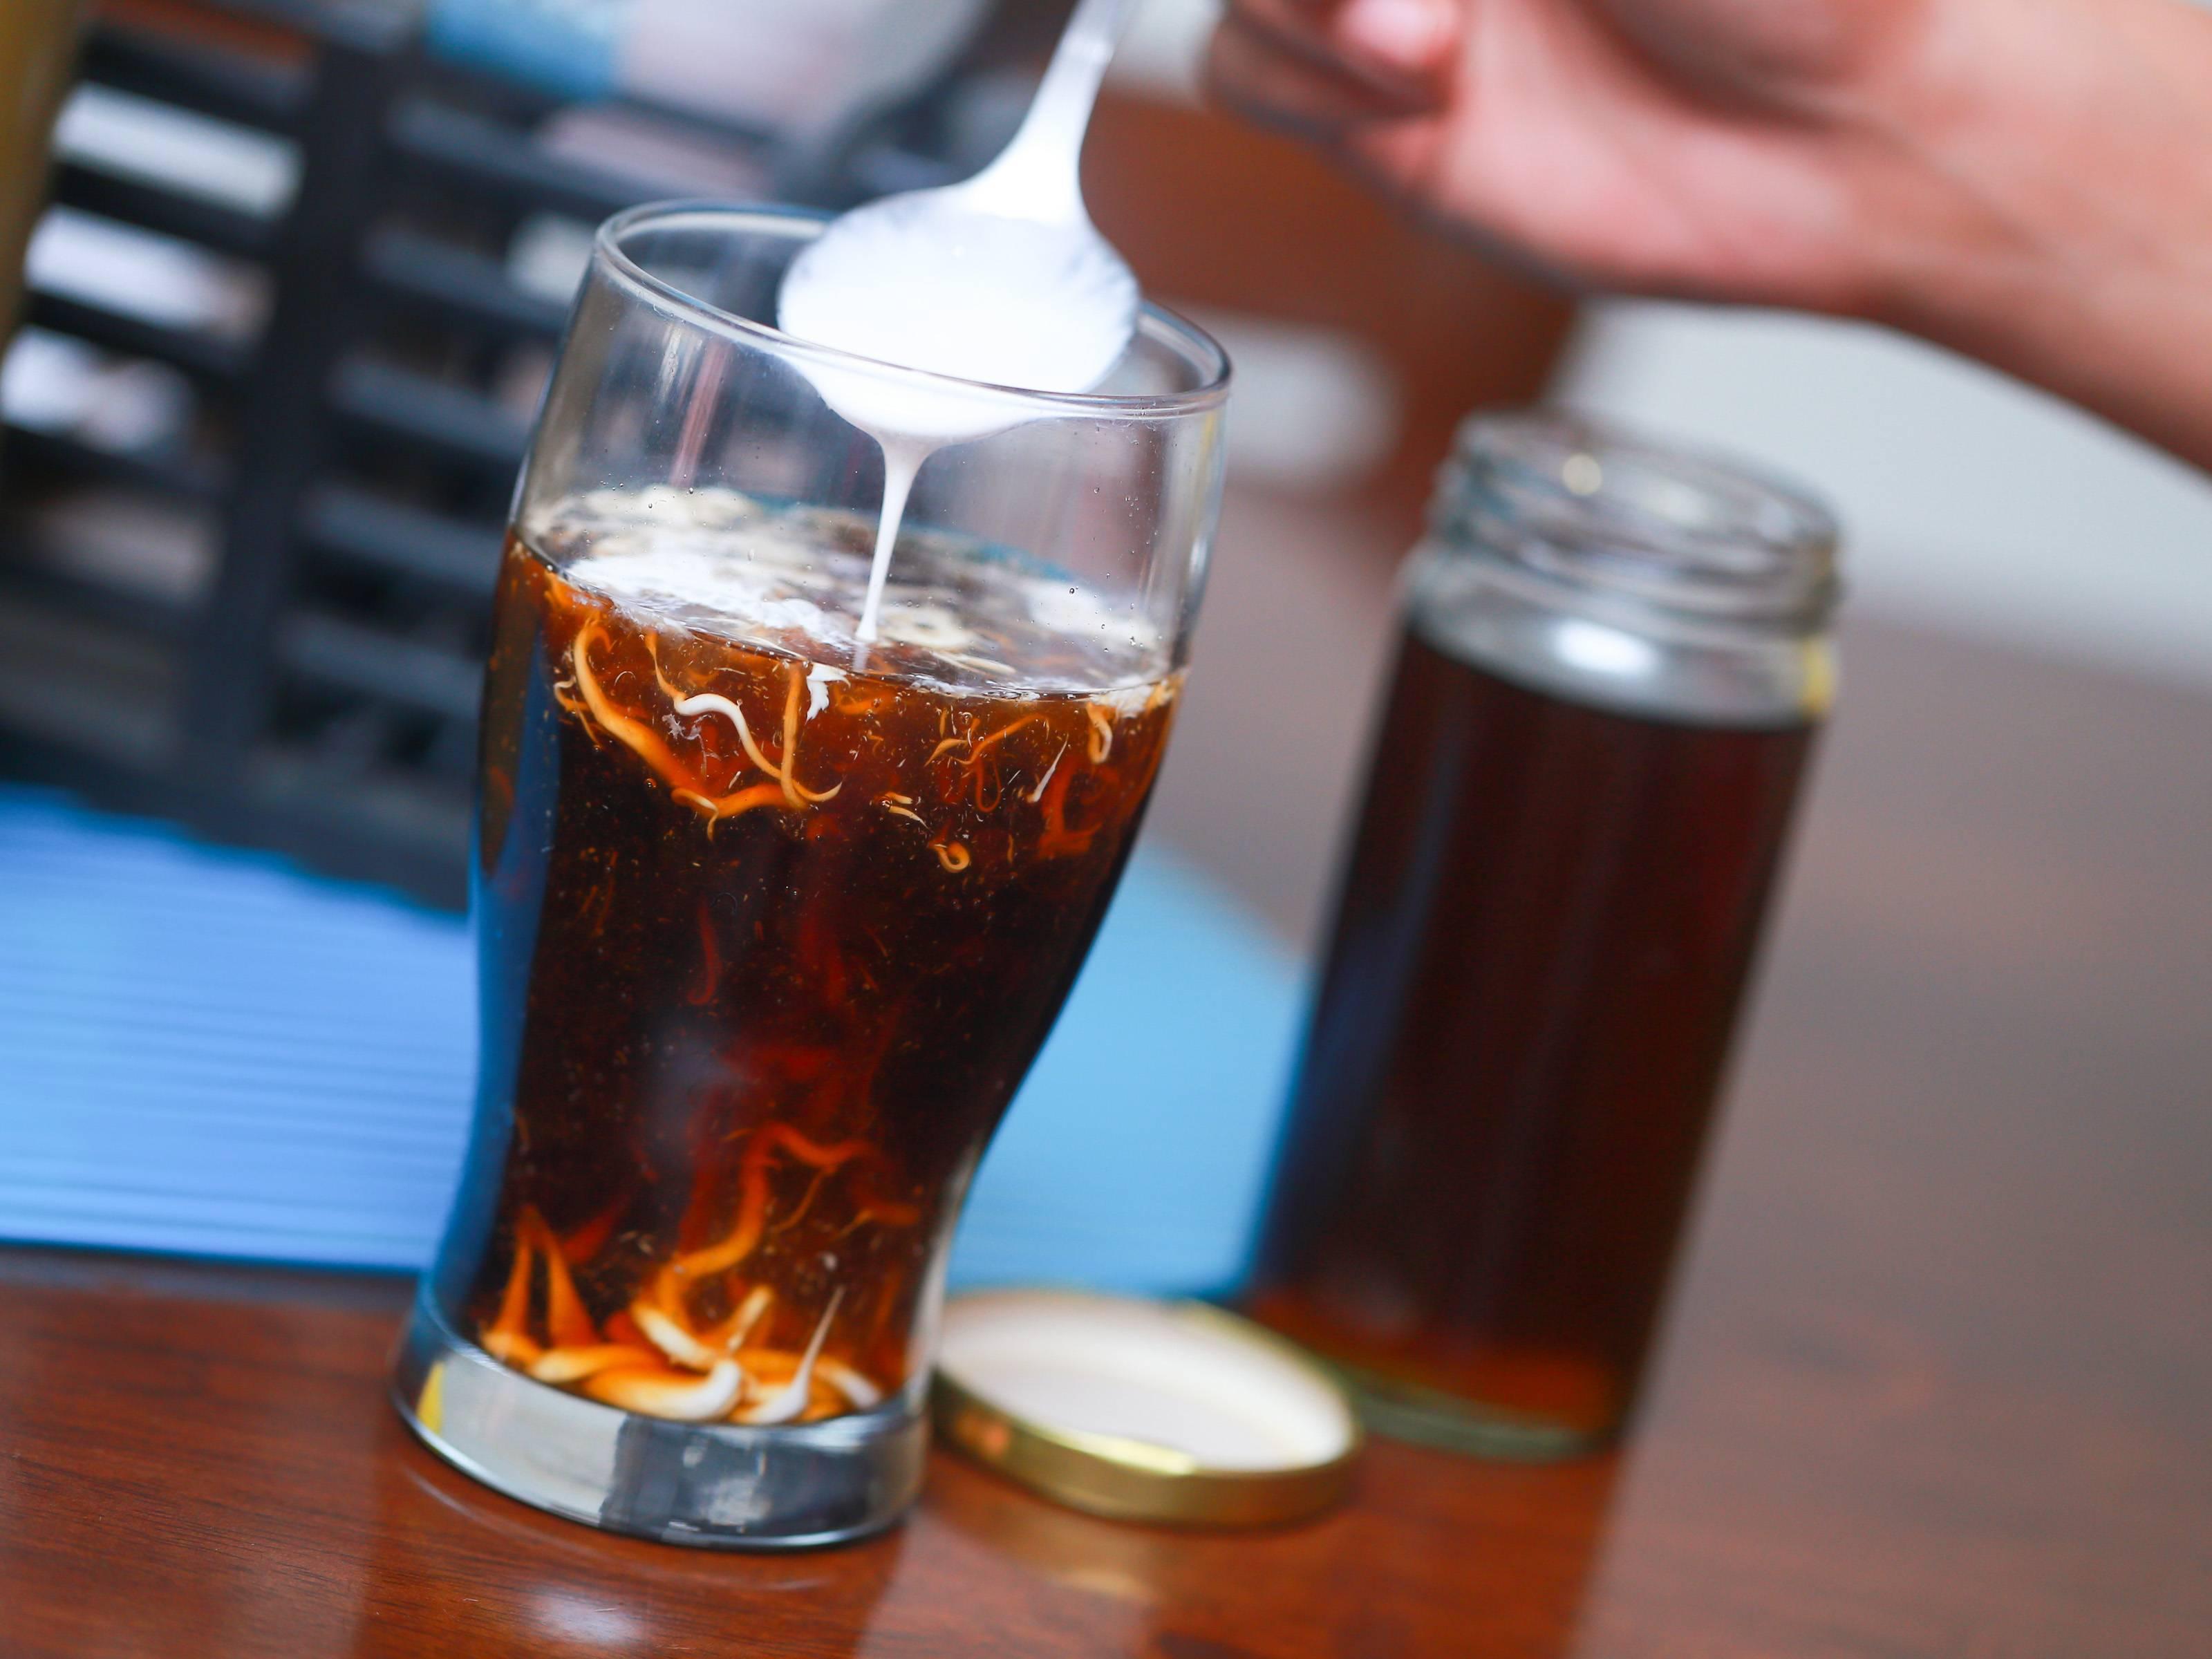 Коктейль энергетик кола и кофе. рецепт за 3 минуты